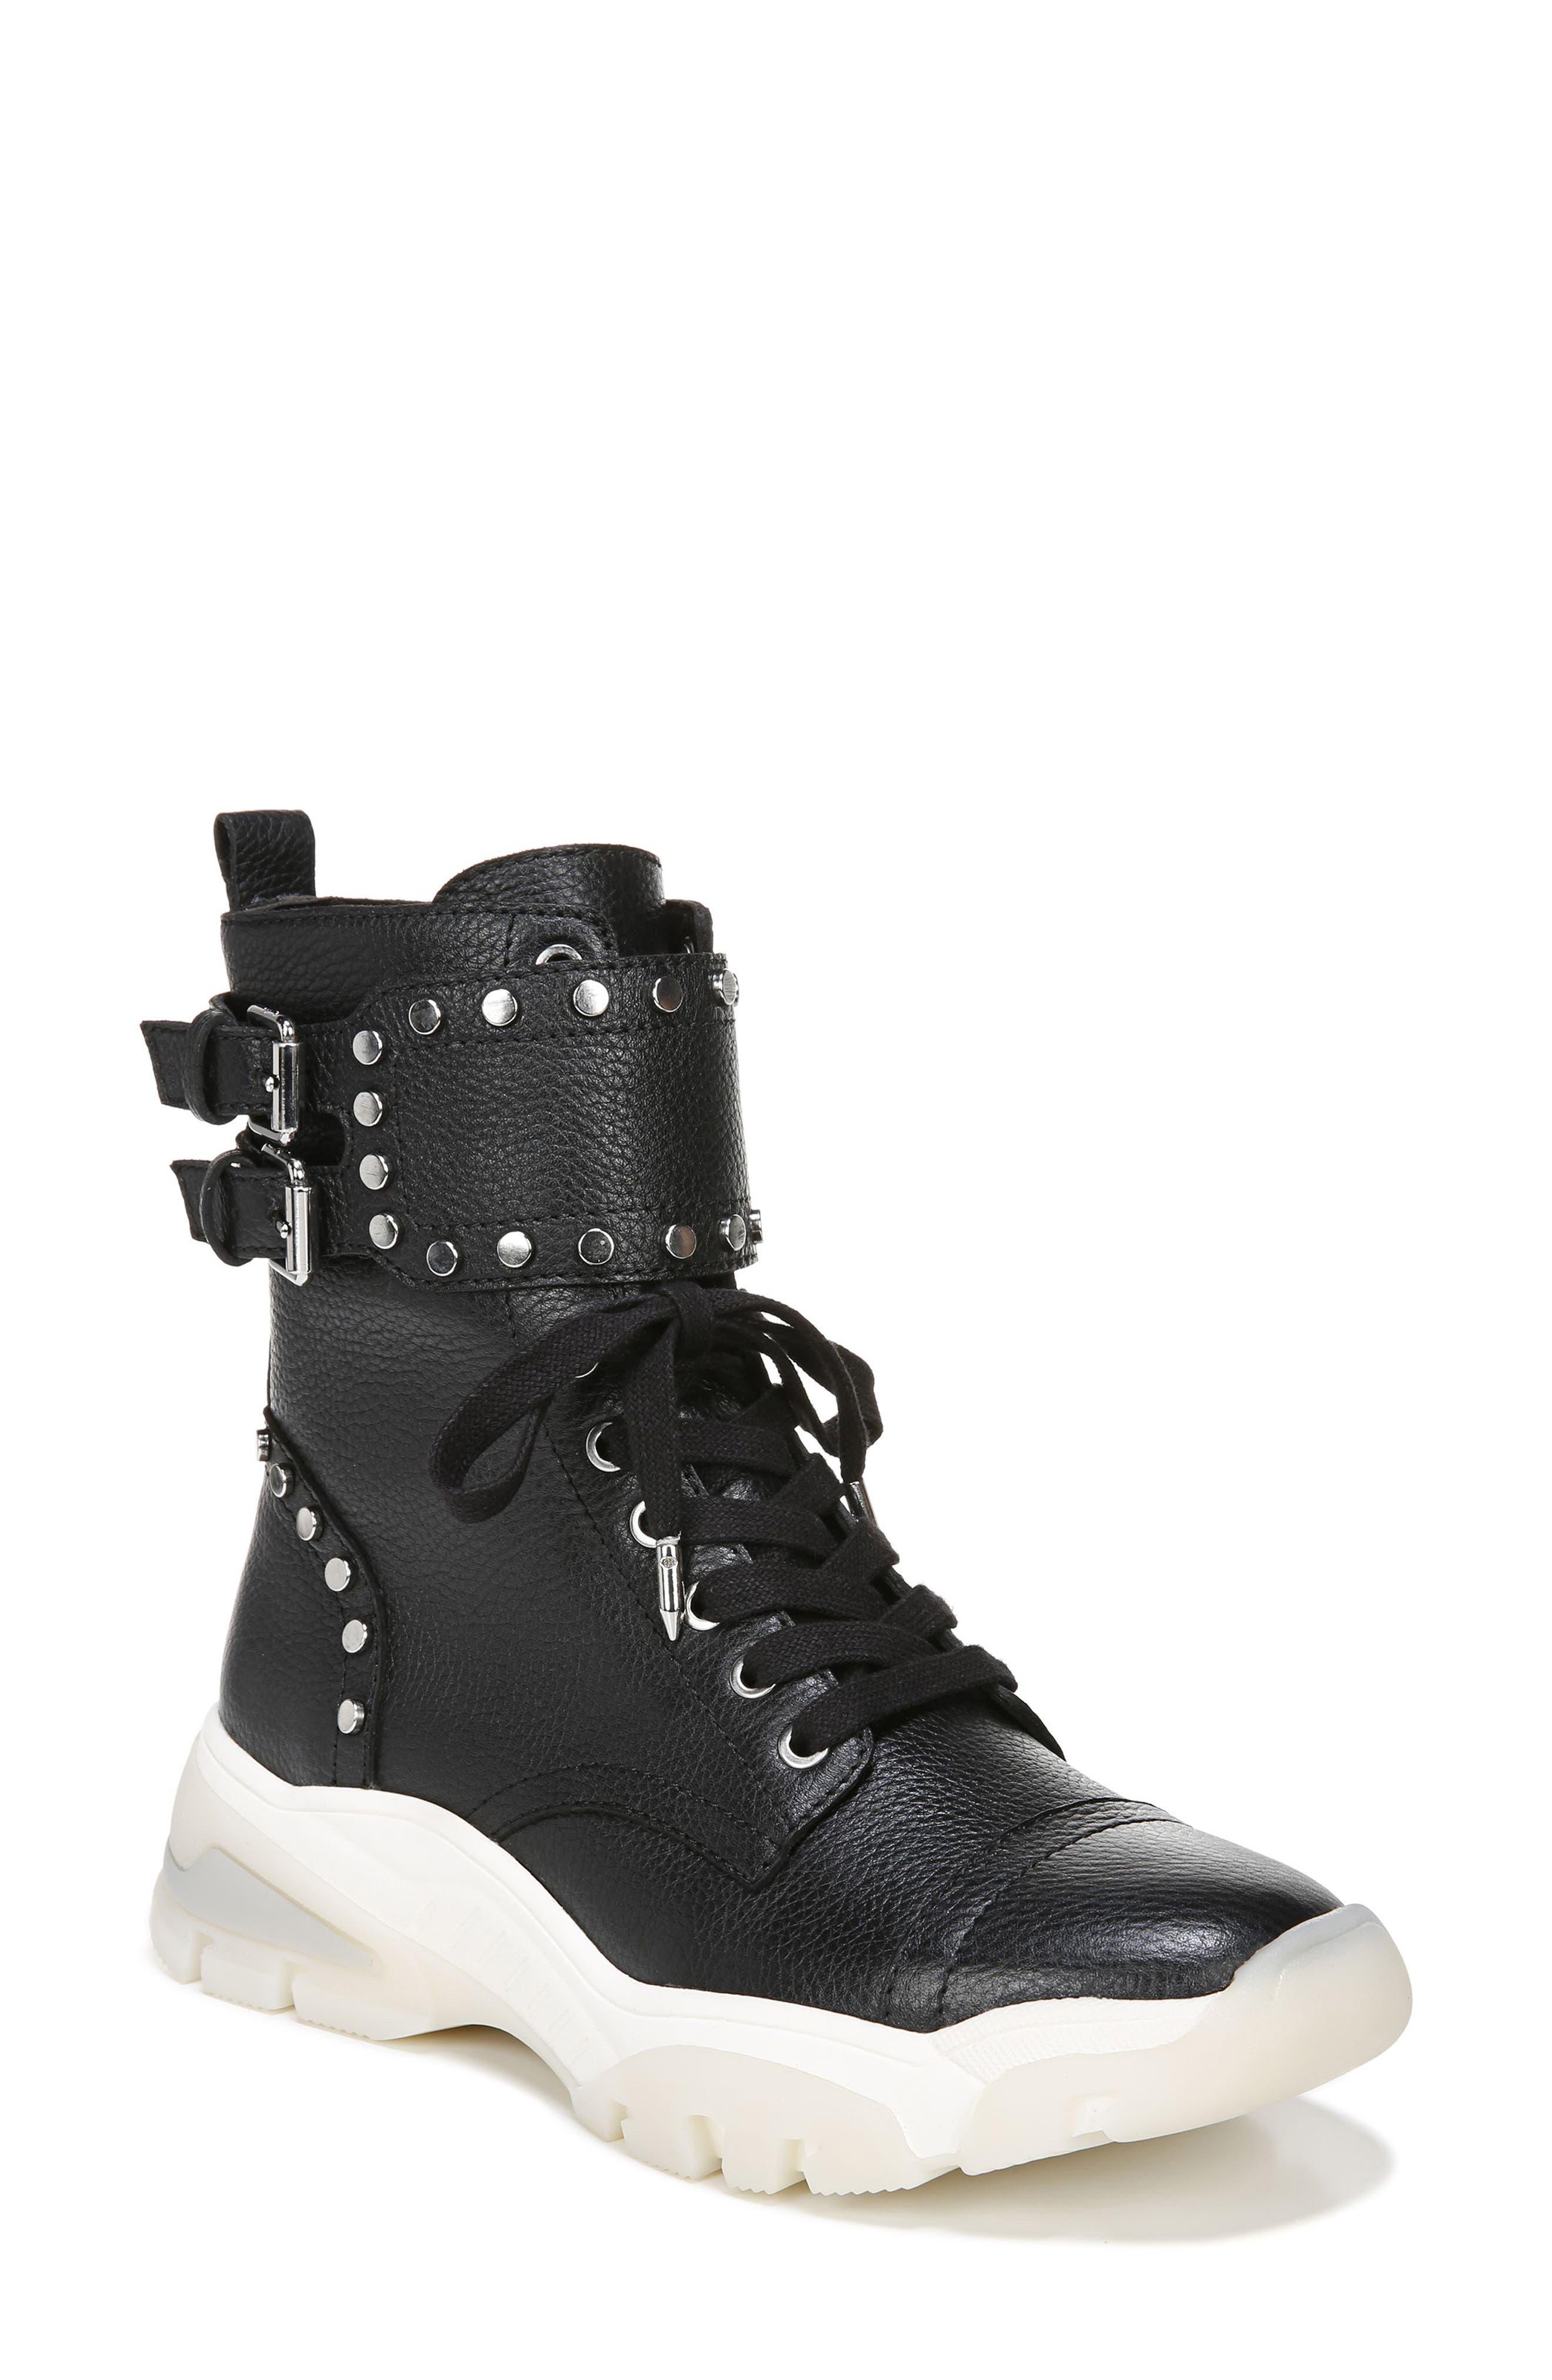 Sam Edelman | Resnie High Top Sneaker